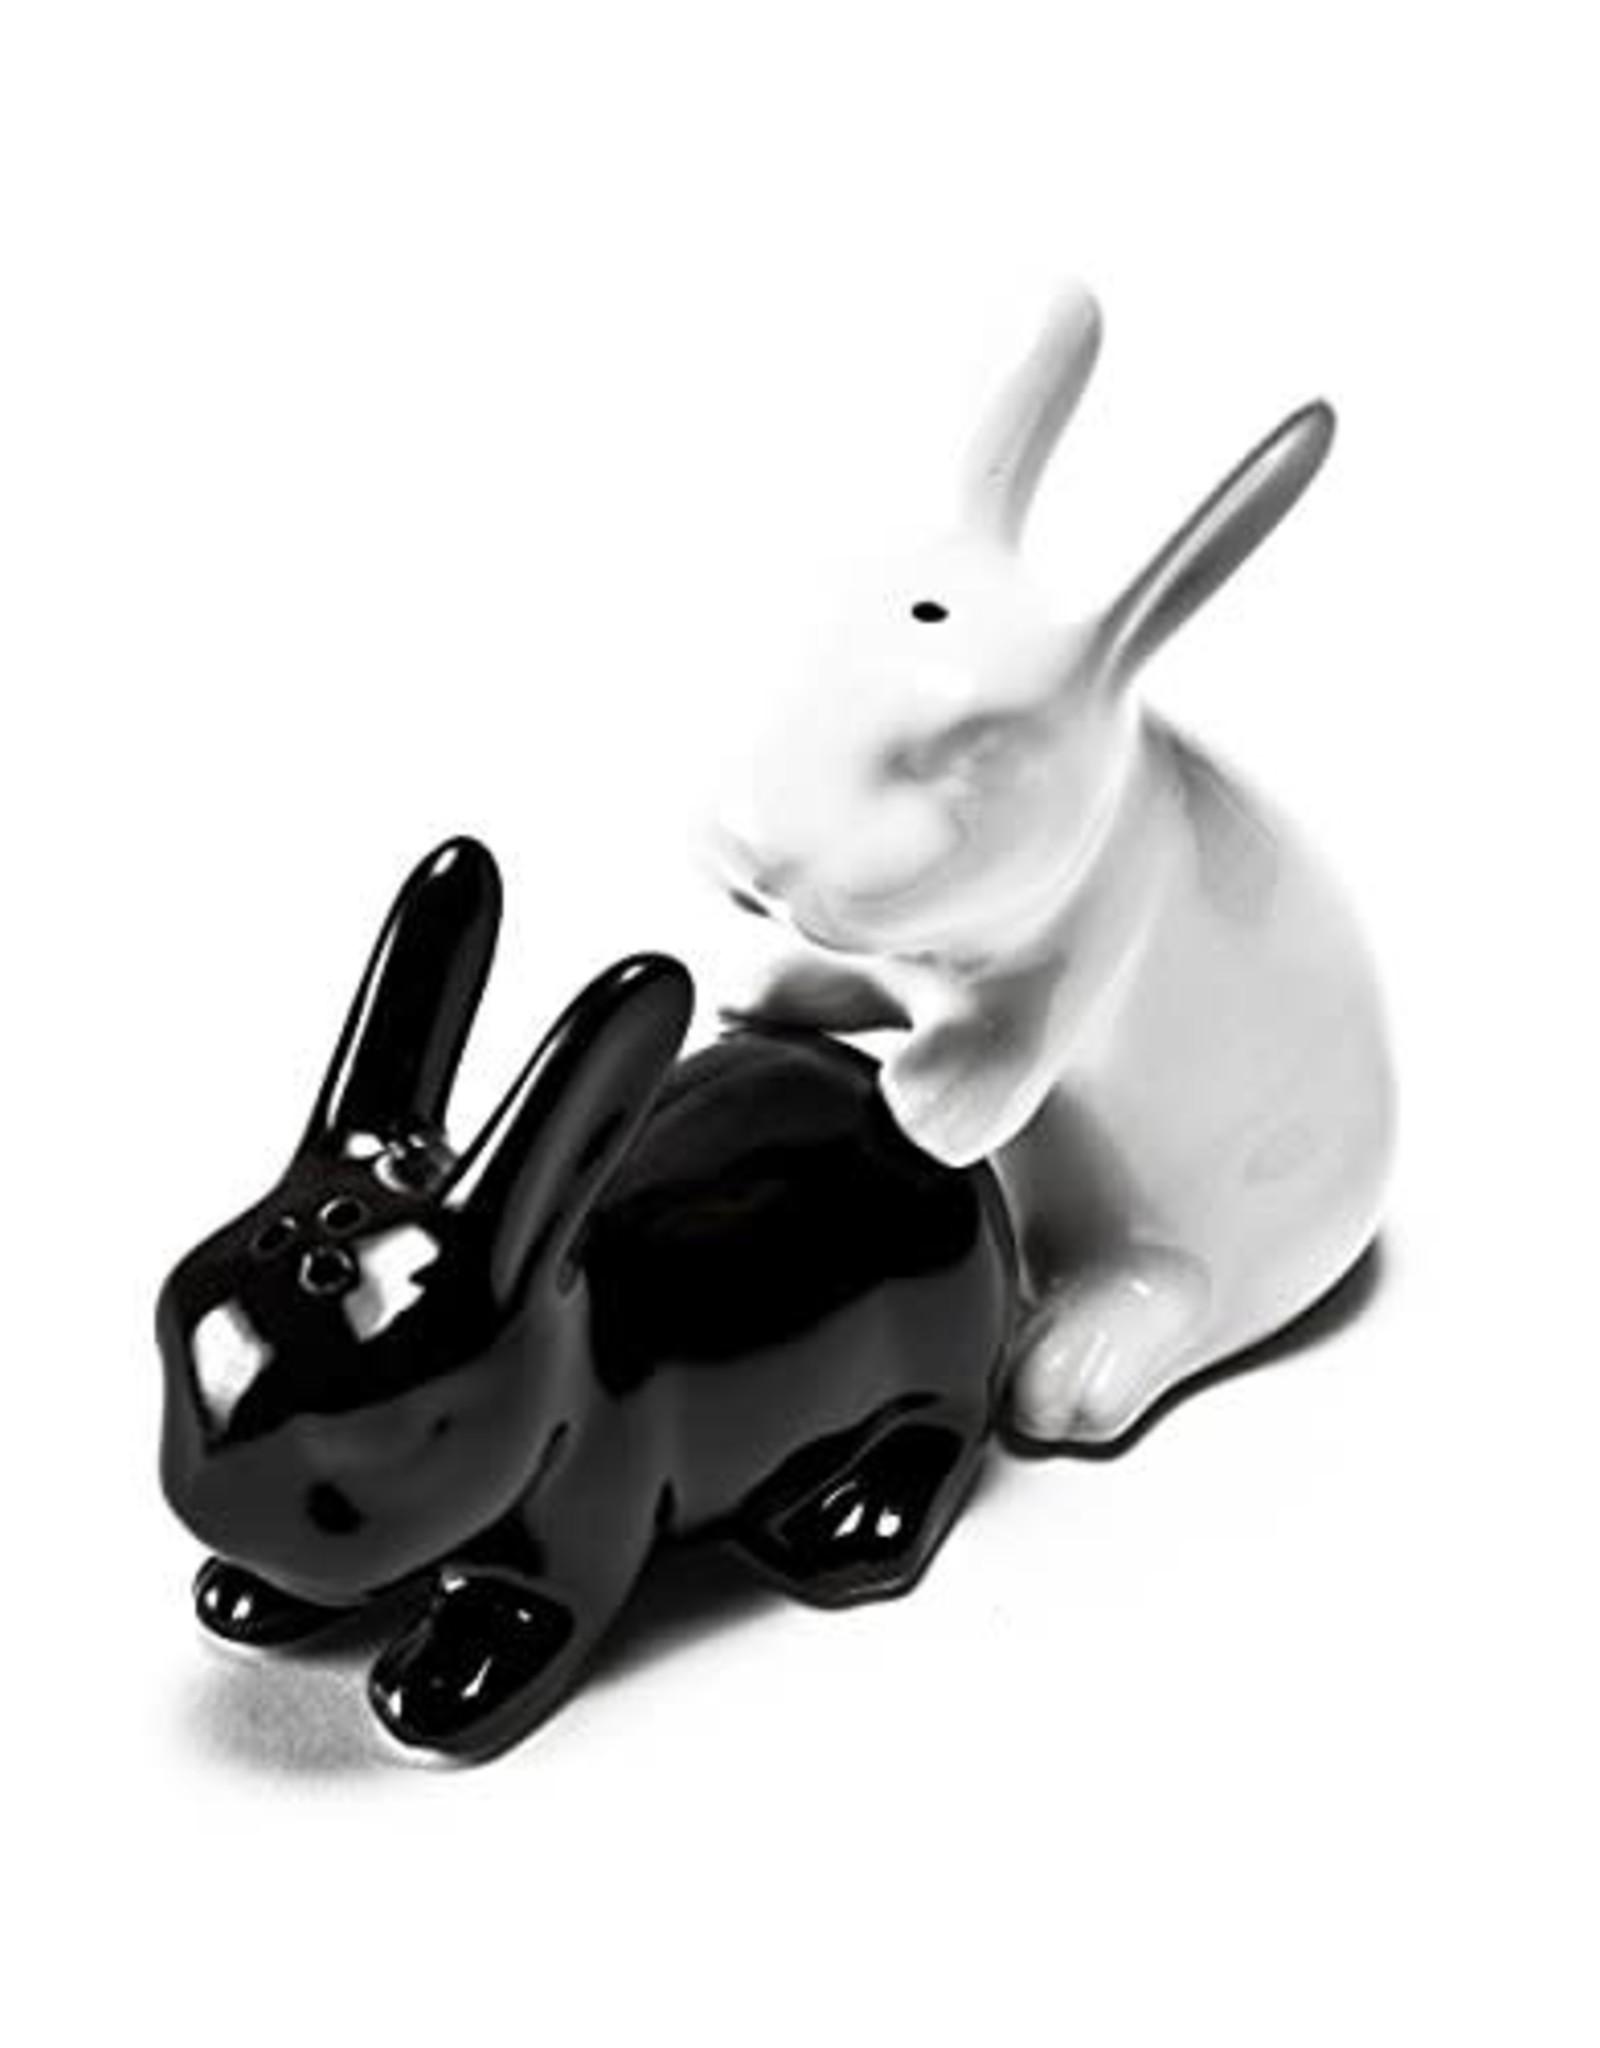 funny salt and pepper shaker - rabbits